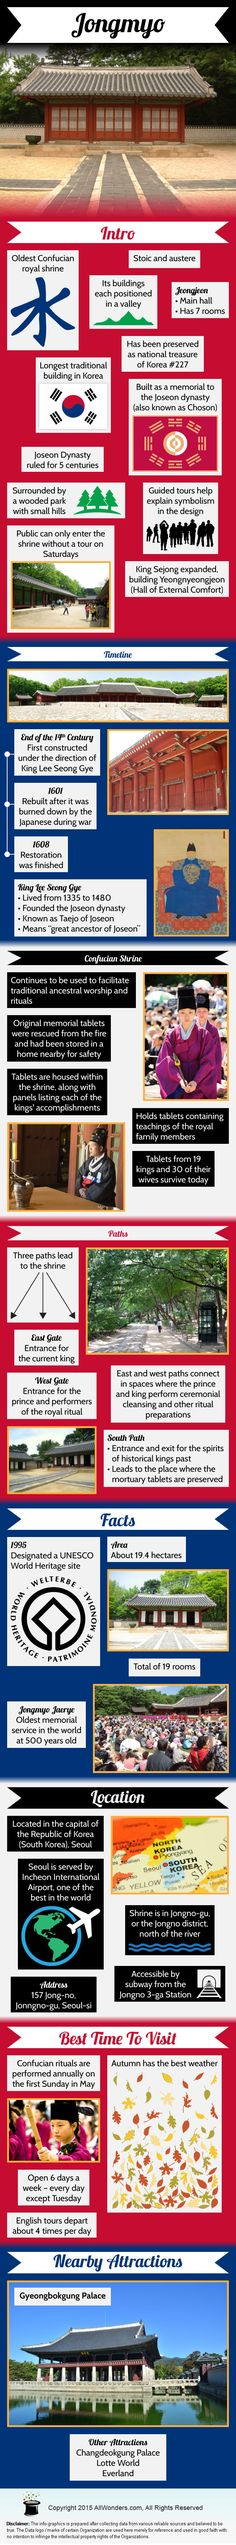 Jongmyo Shrine - Facts & Infographic